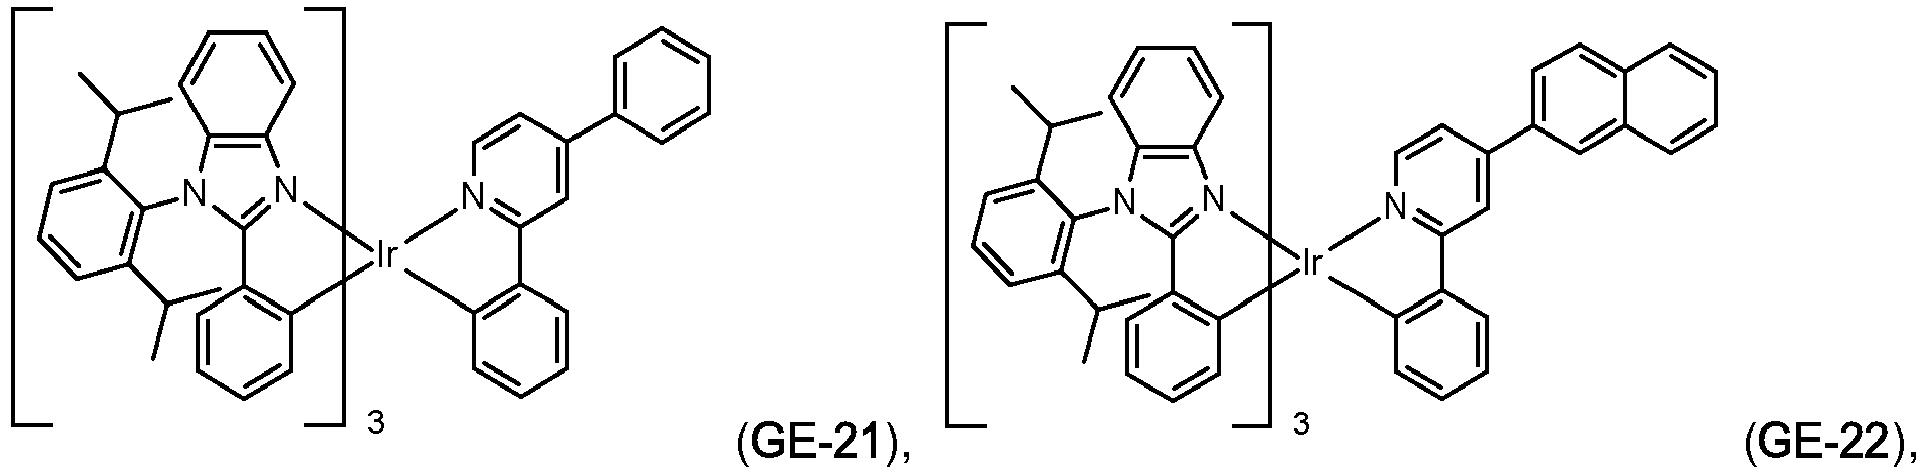 Figure imgb0818